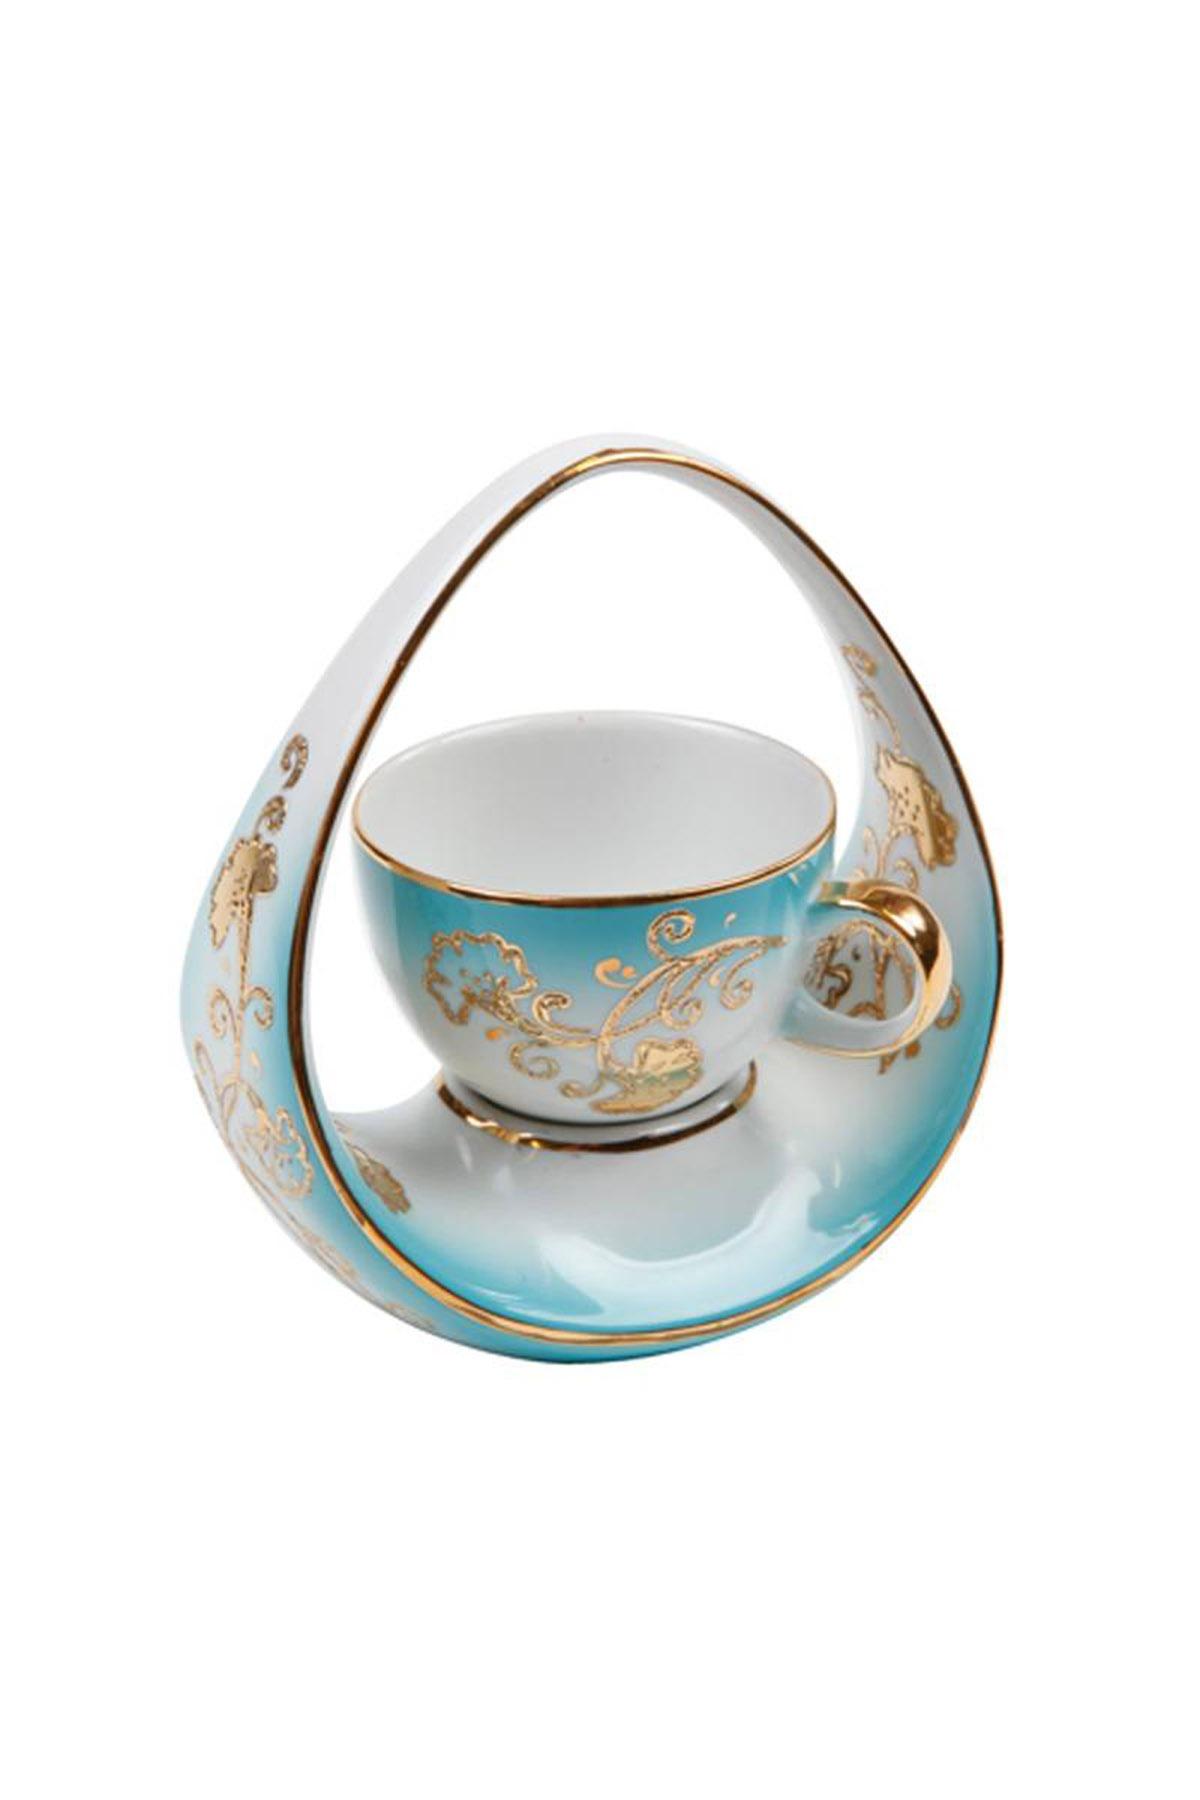 Kütahya Porselen - Kütahya Porselen El Yapımı Sepet Kahve Fincan Mav